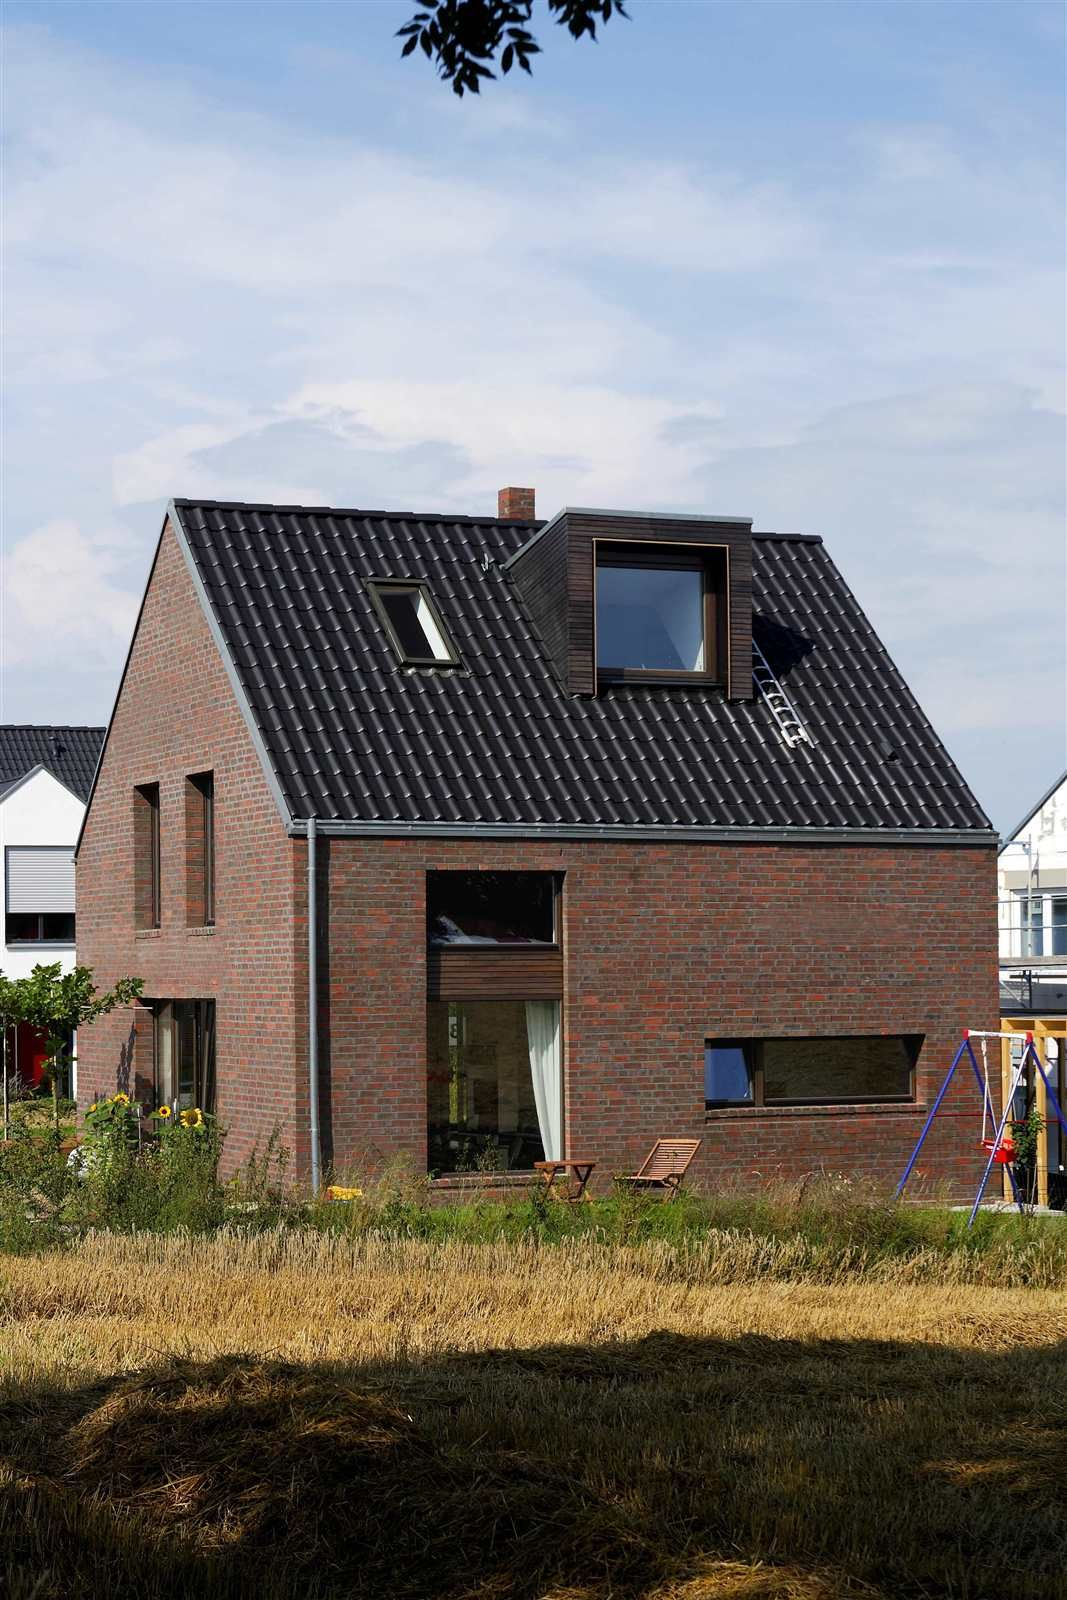 Dachgaube Modern kompaktes ziegelhaus mit erdwärmepumpe neubau hausideen so